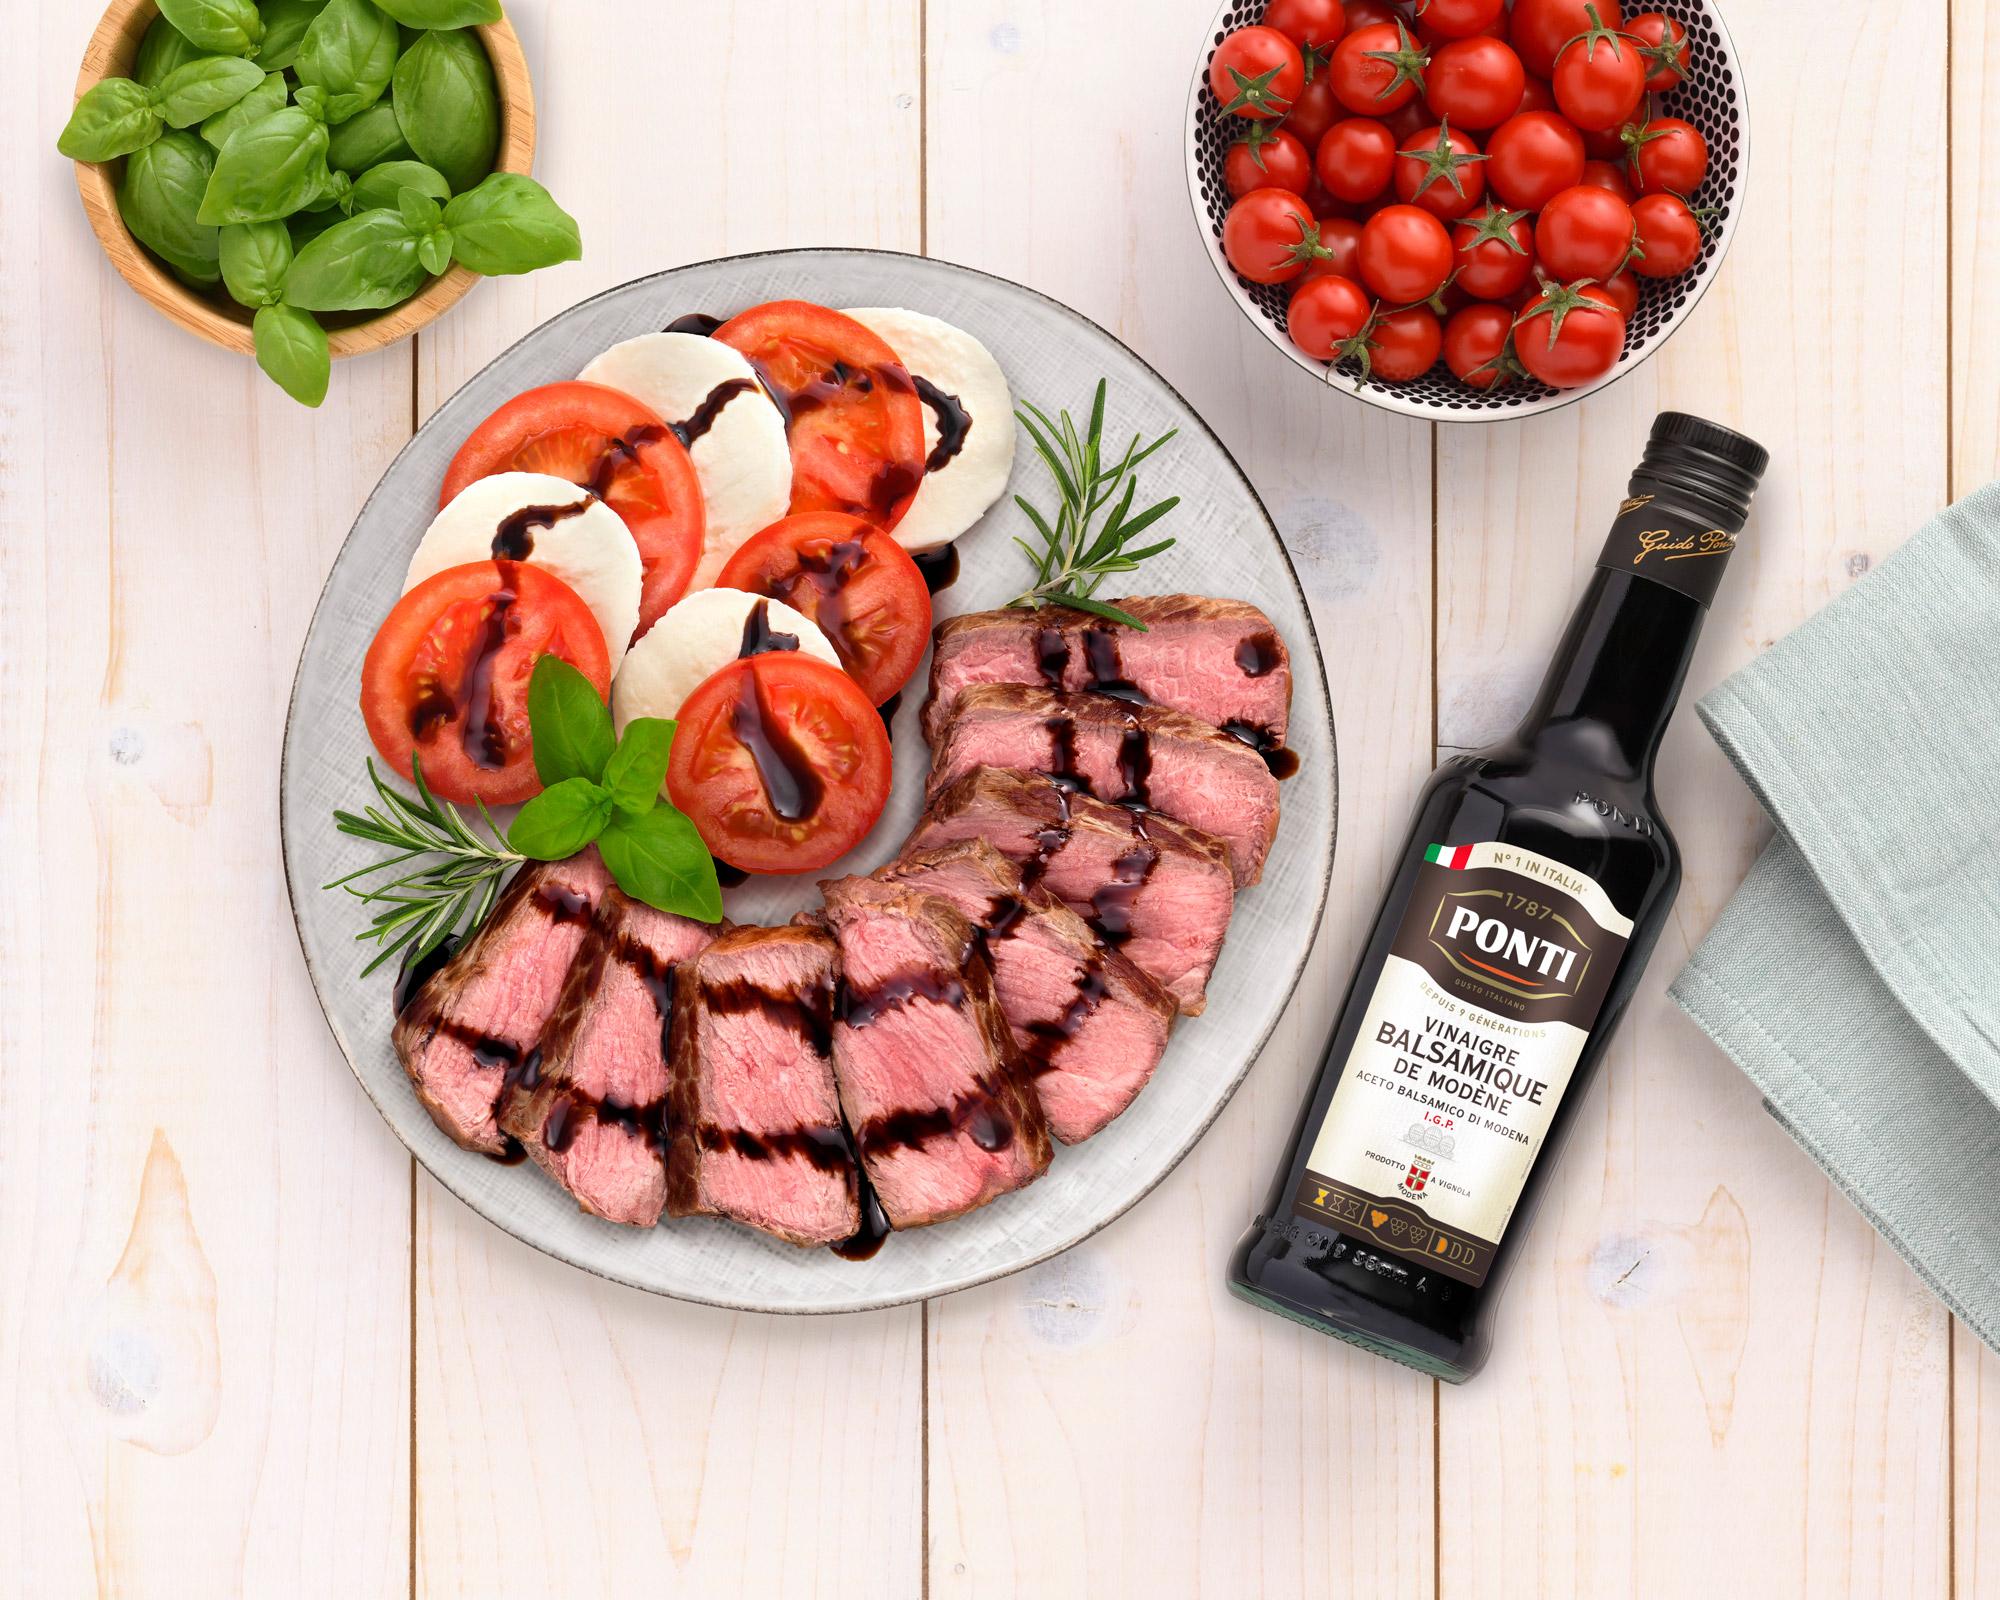 Assiette italienne : tagliata de bœuf et salade caprese - Ponti